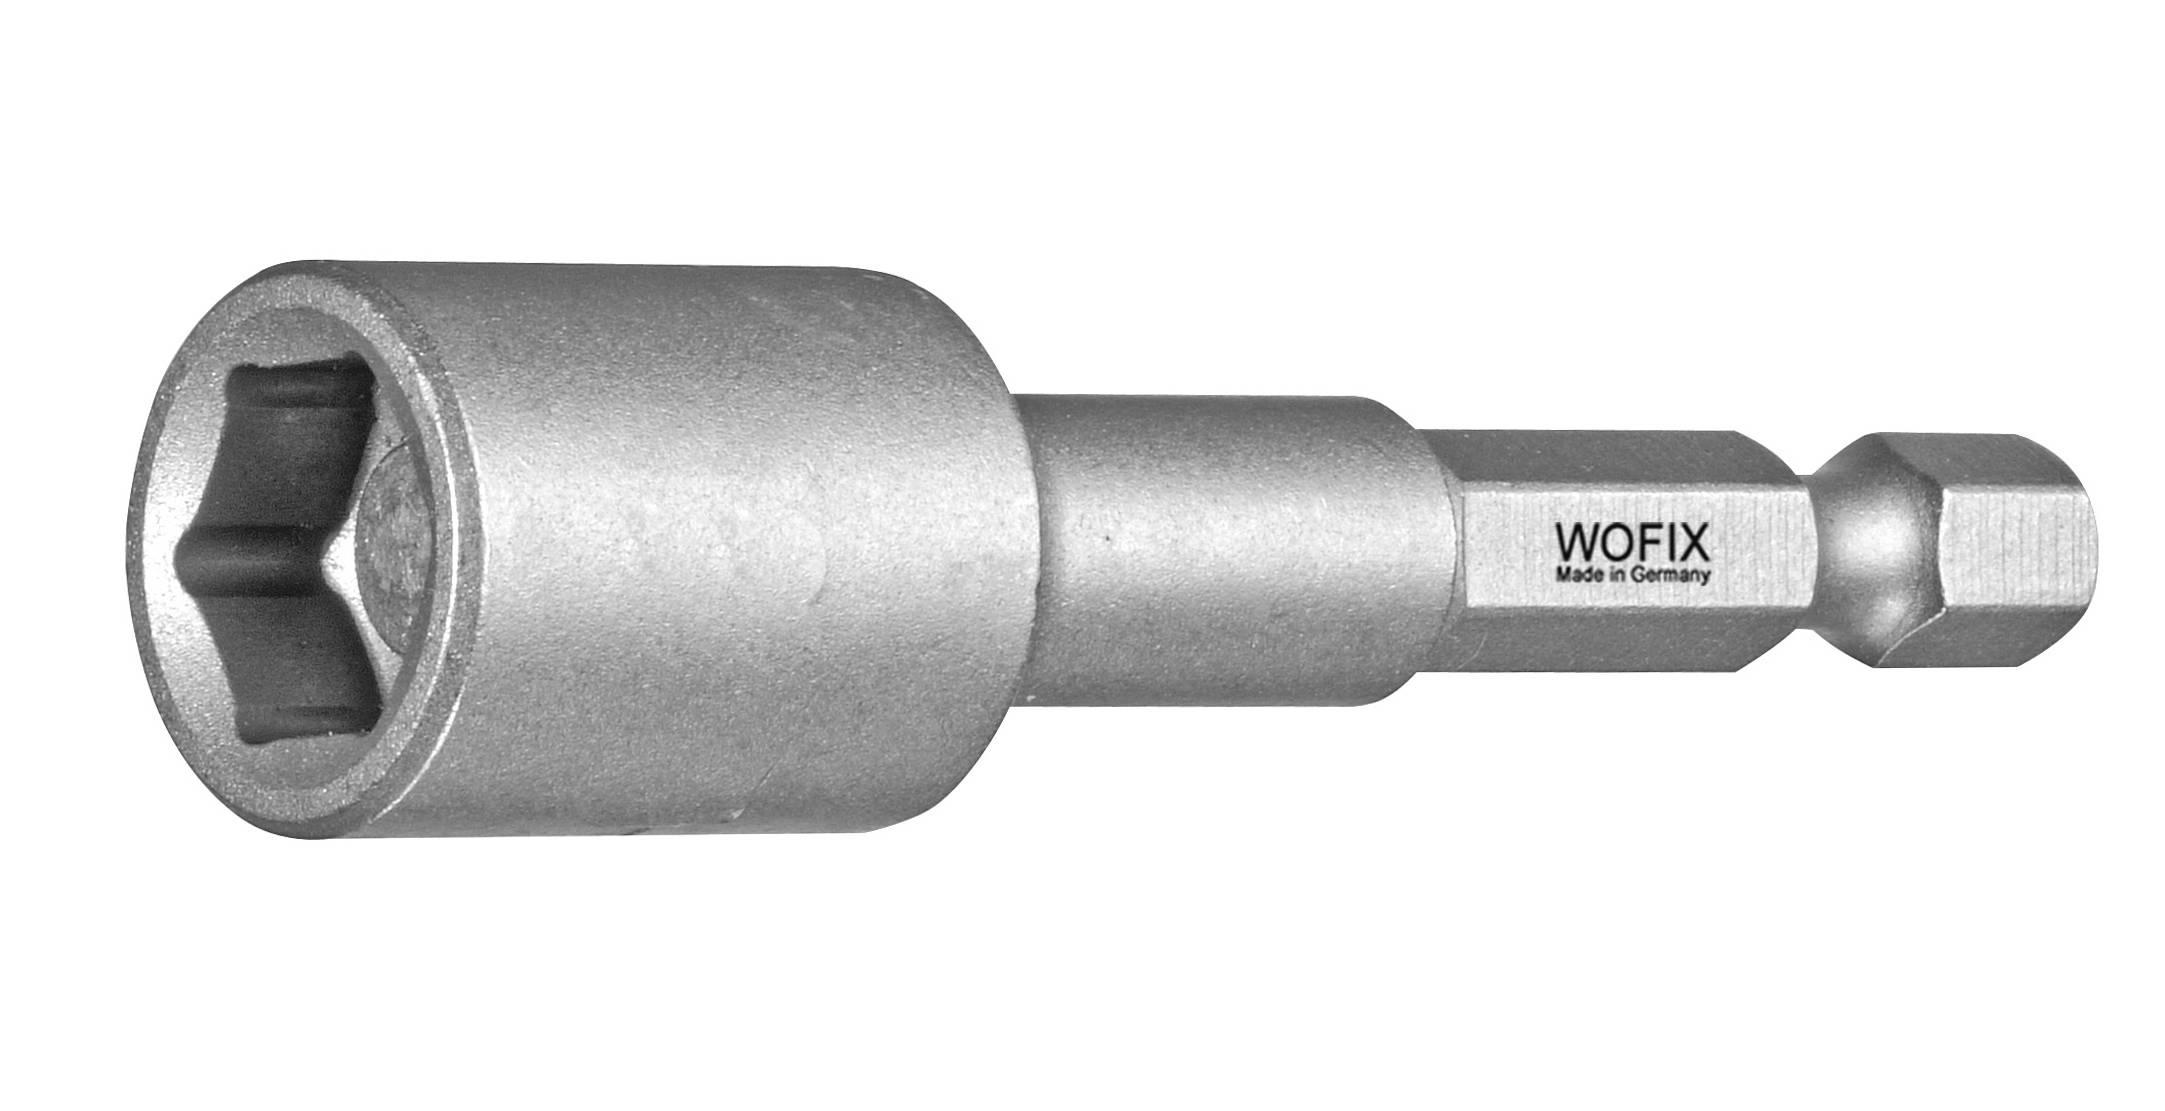 Wofix 7358130 Professional standard Dopbit - SW13,0 50 mm